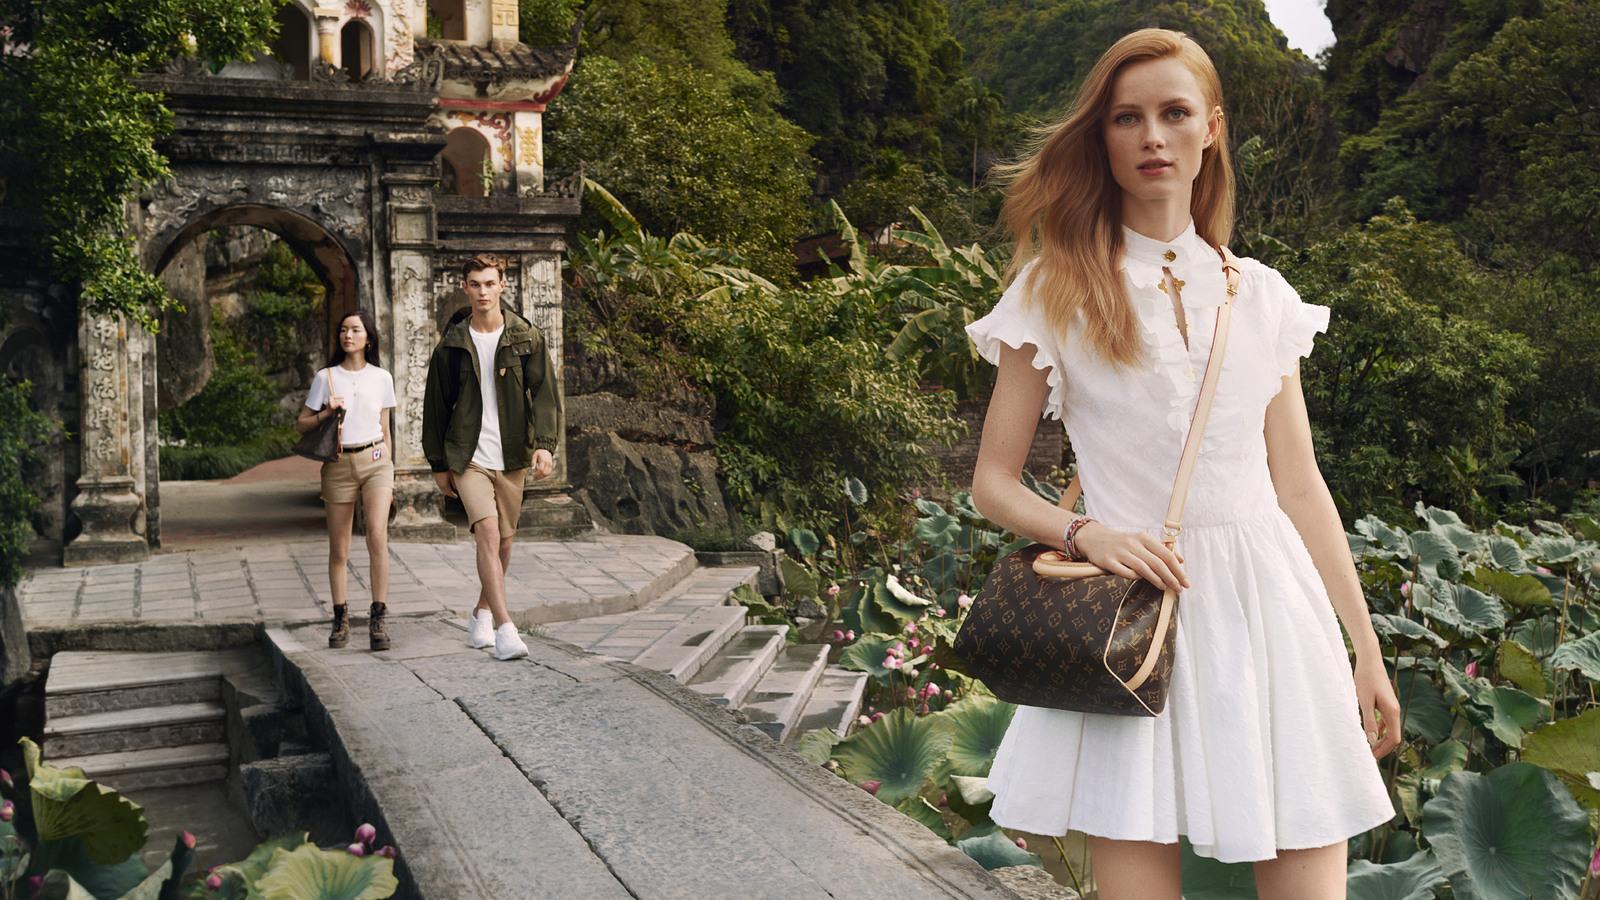 louis vuitton - 2 1568261402 - Việt Nam tuyệt đẹp trong quảng cáo mới của Louis Vuitton